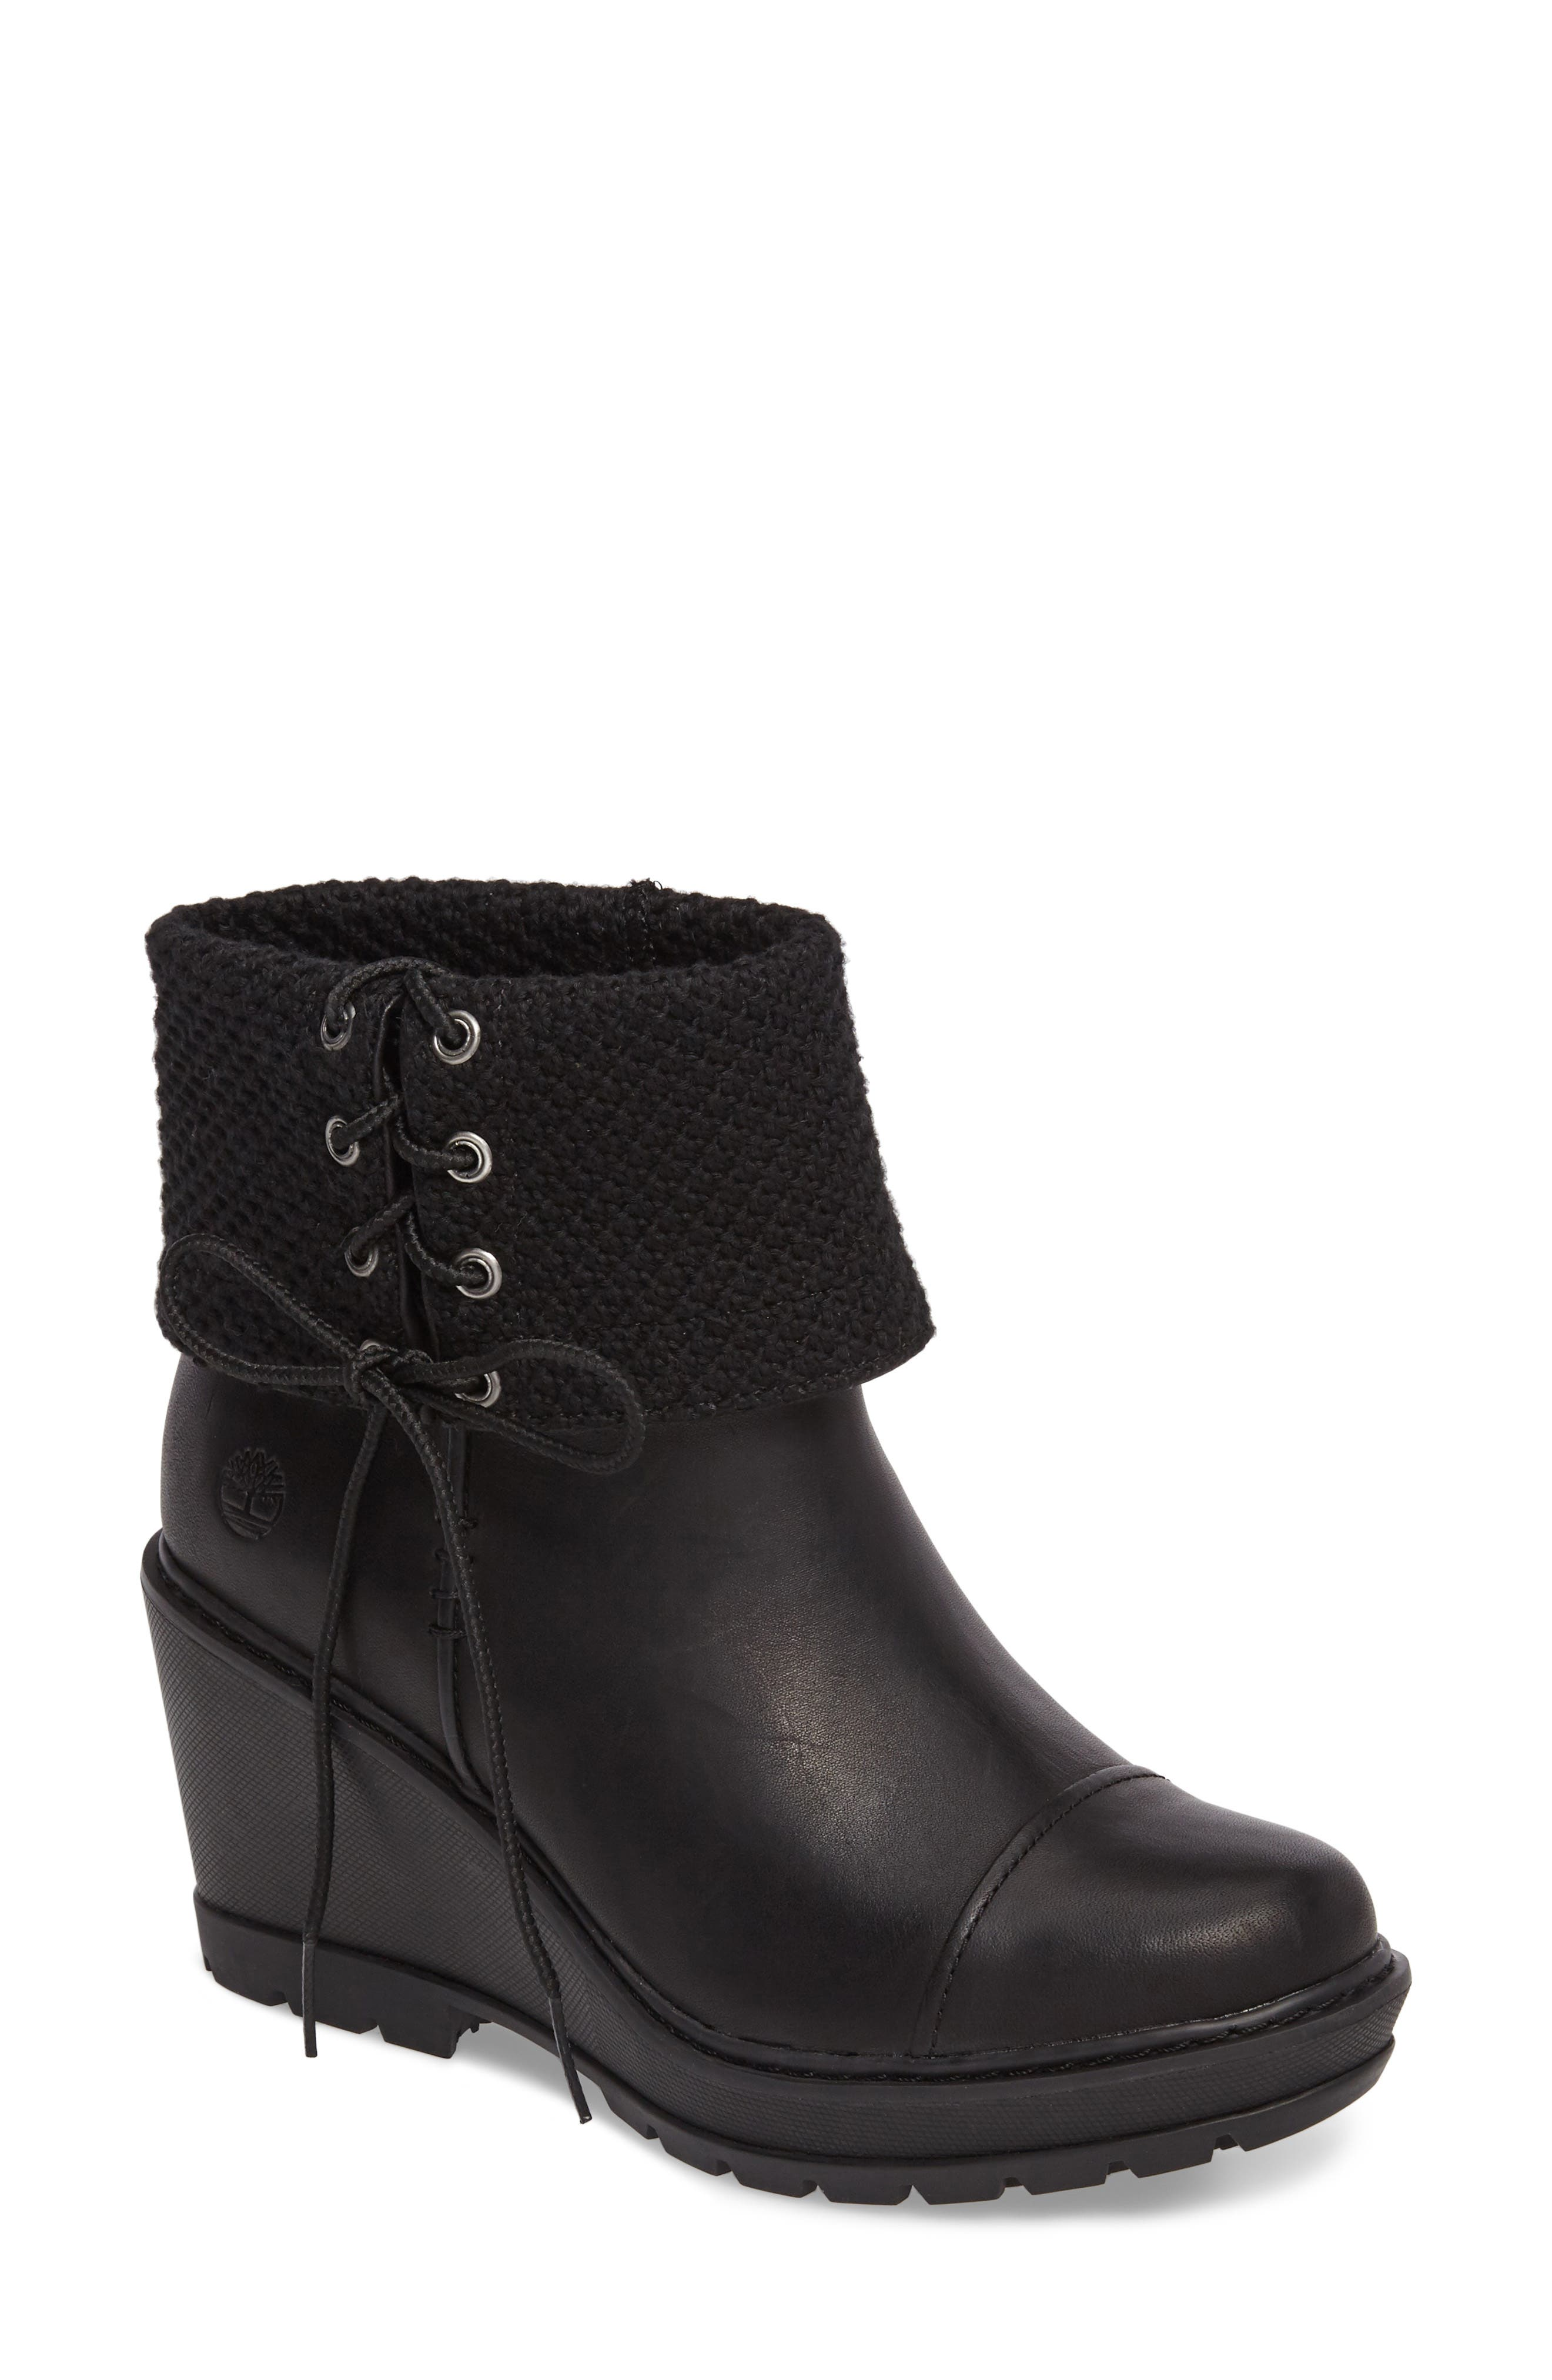 Main Image - Timberland Kellis Fold Down Water Resistant Boot (Women)